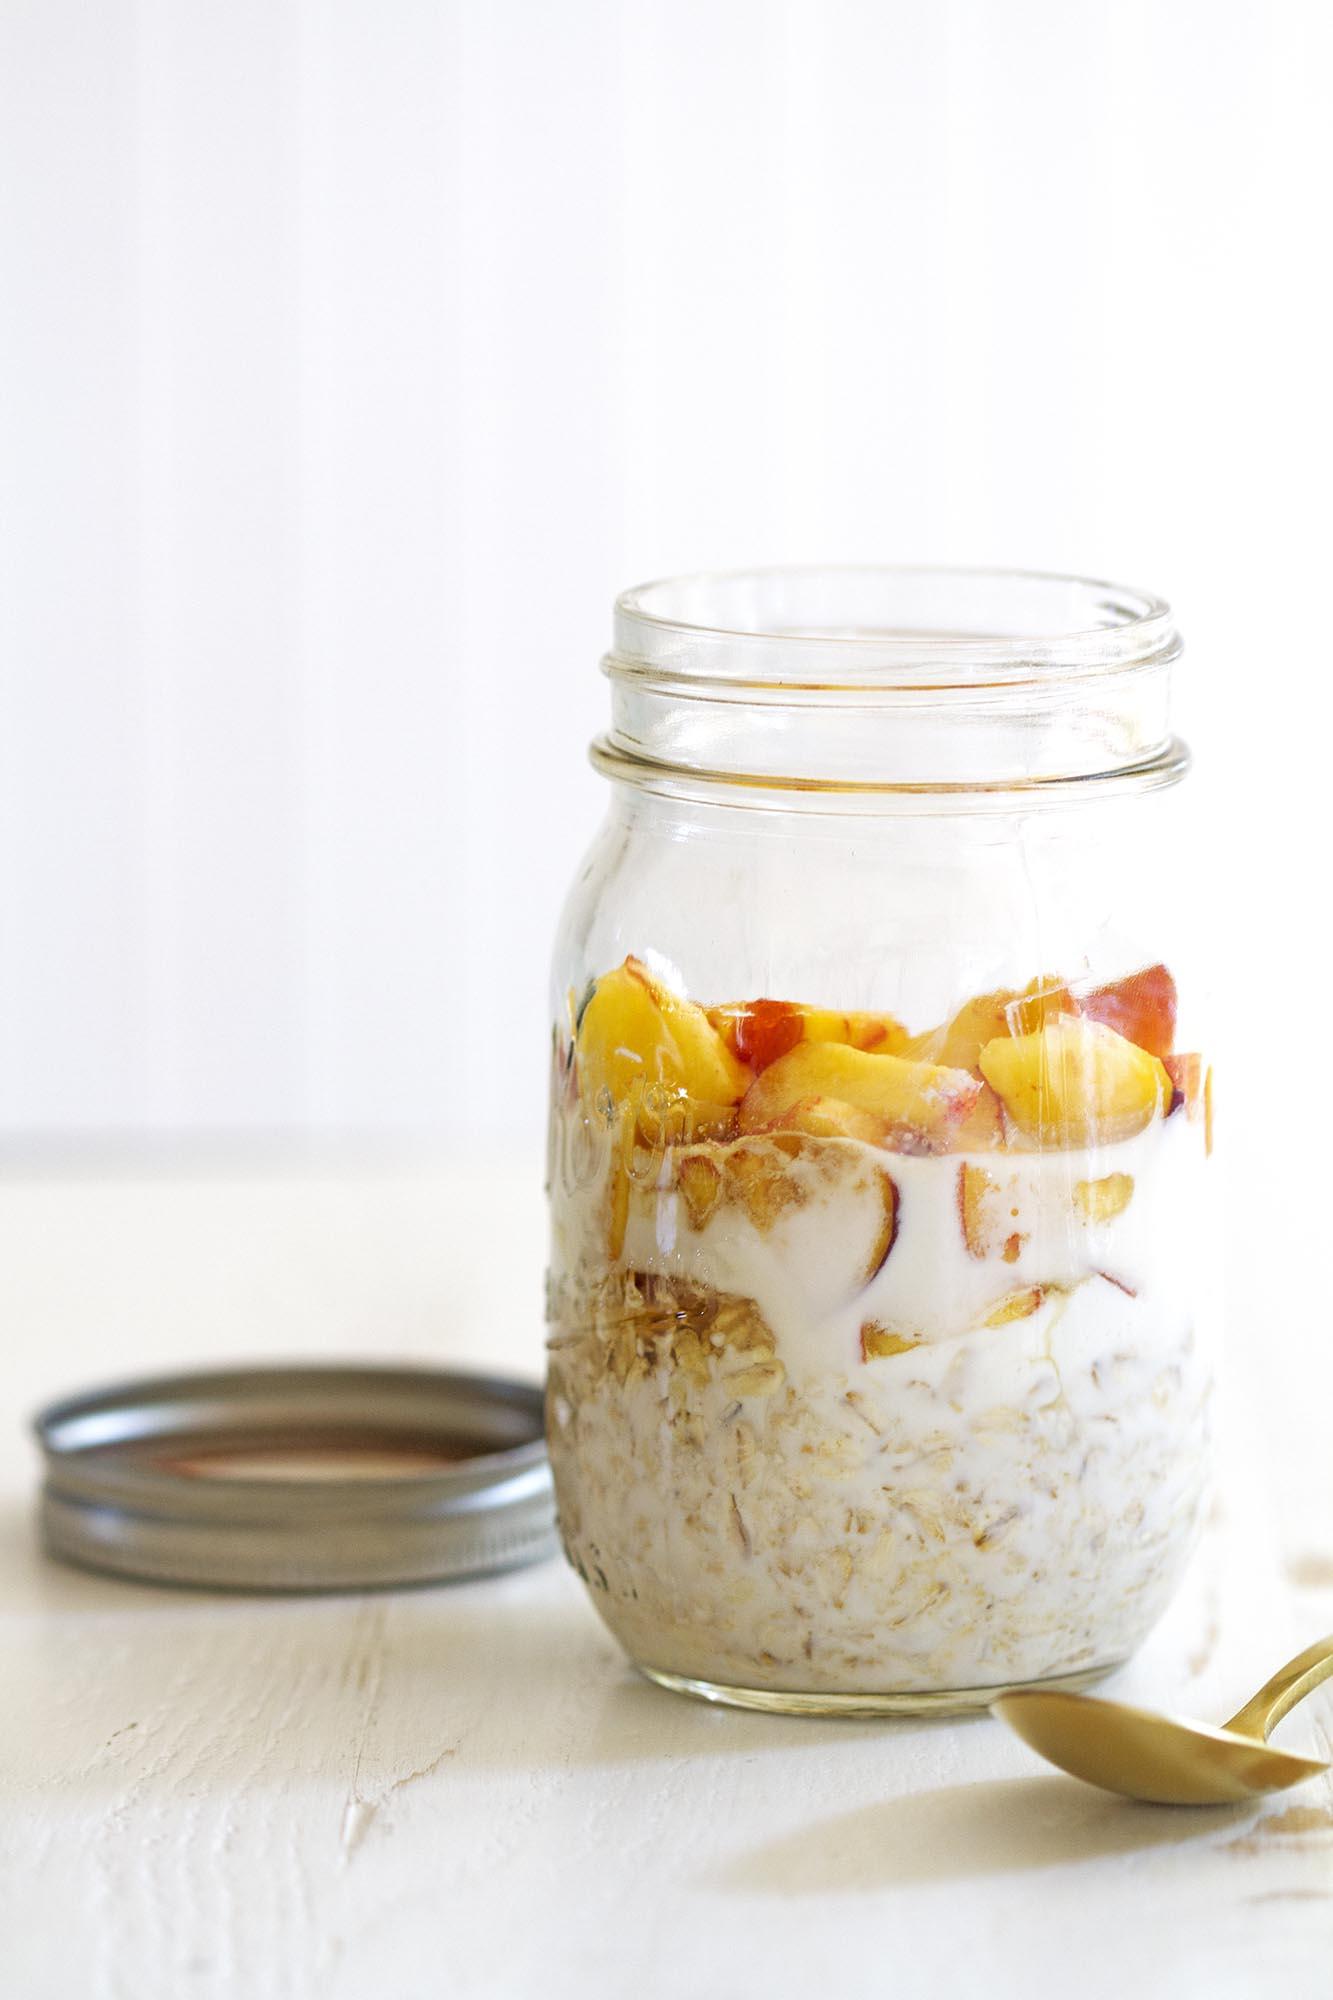 peaches and cream overnight oats